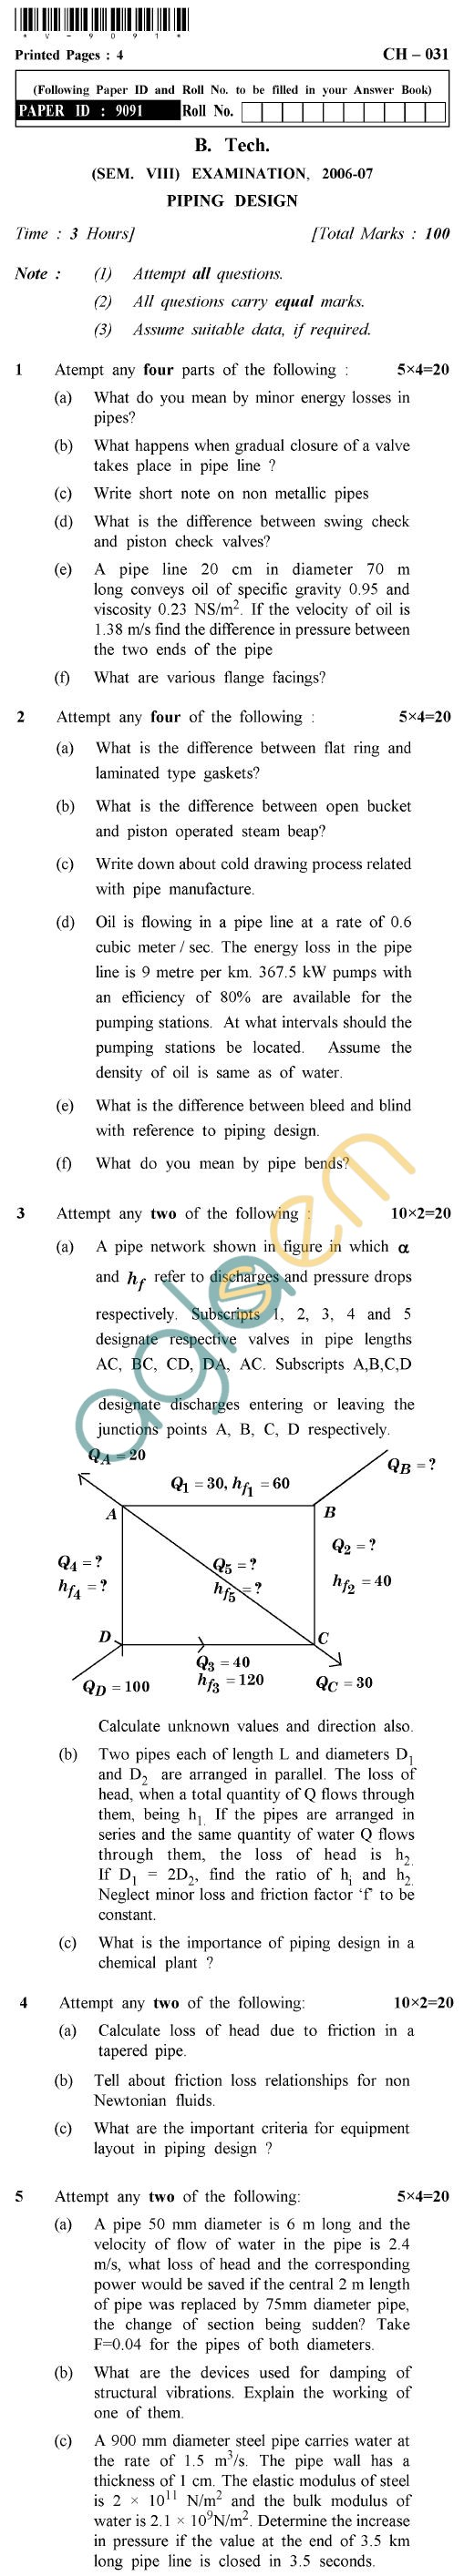 UPTU B.Tech Question Papers -CH-031 - Piping Design